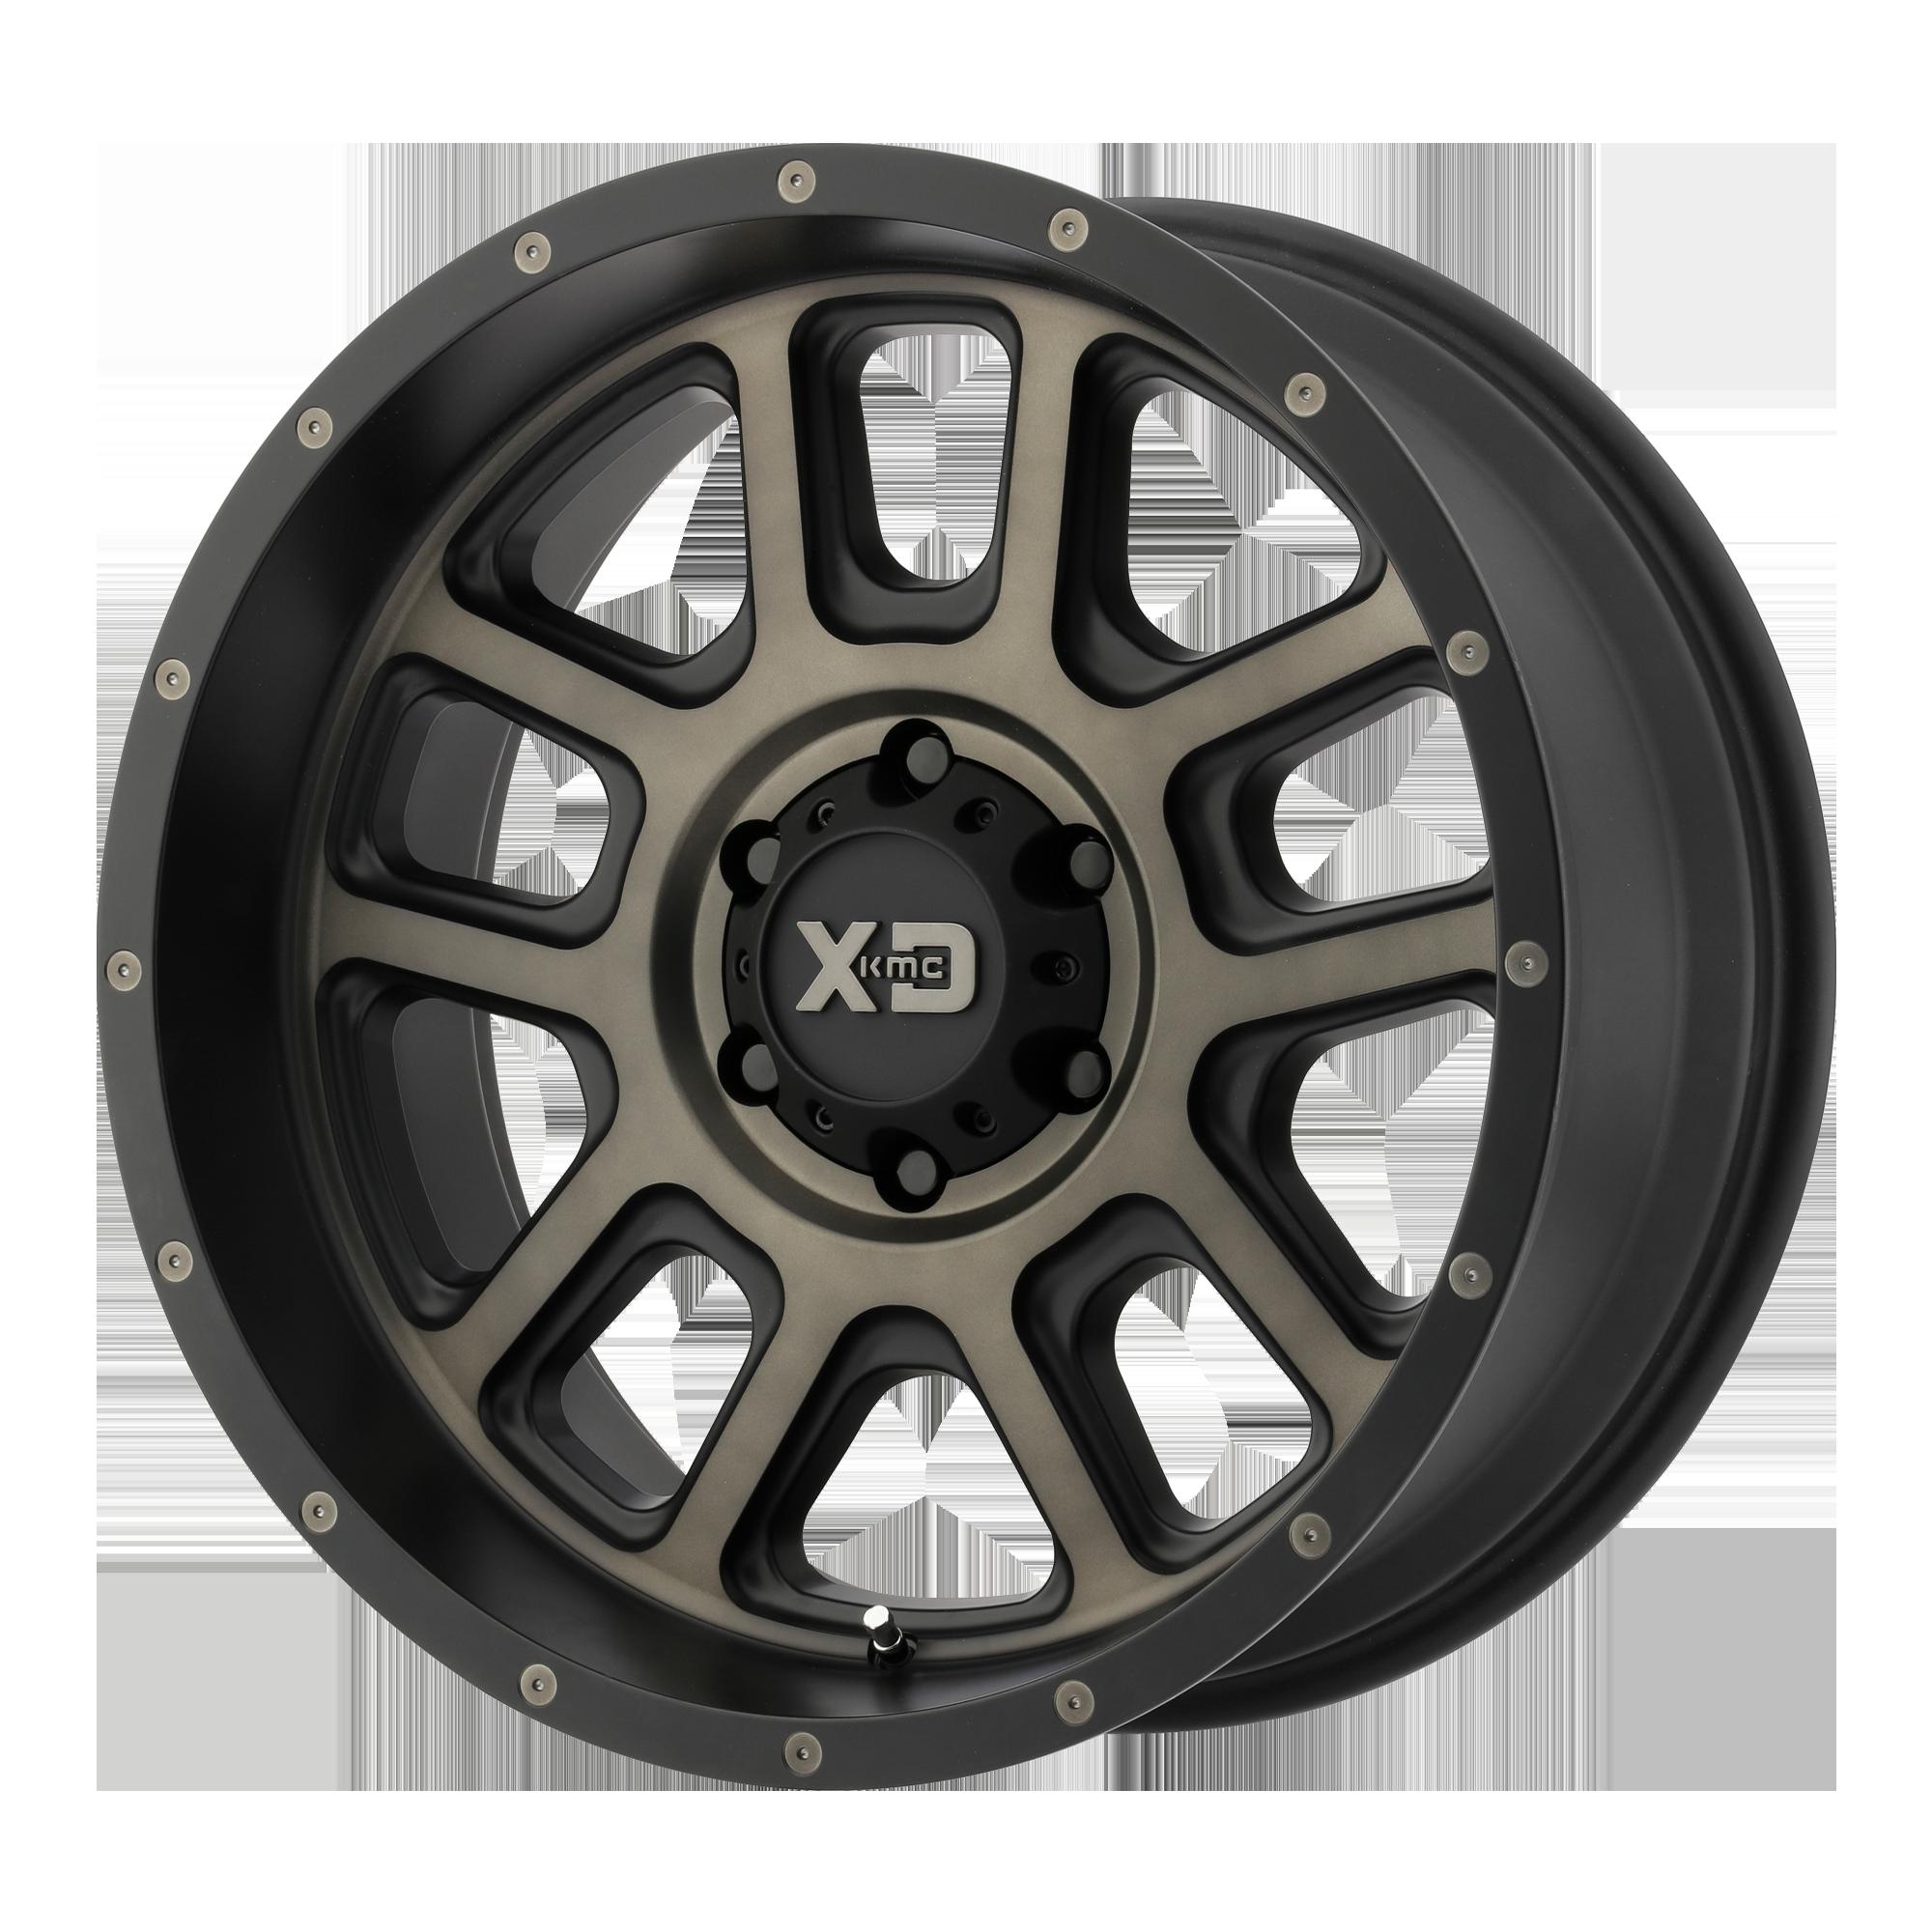 XD SERIES XD828 DELTA hliníkové disky 9x20 6x120 ET18 Matte Black w/ Dark Tint Clear